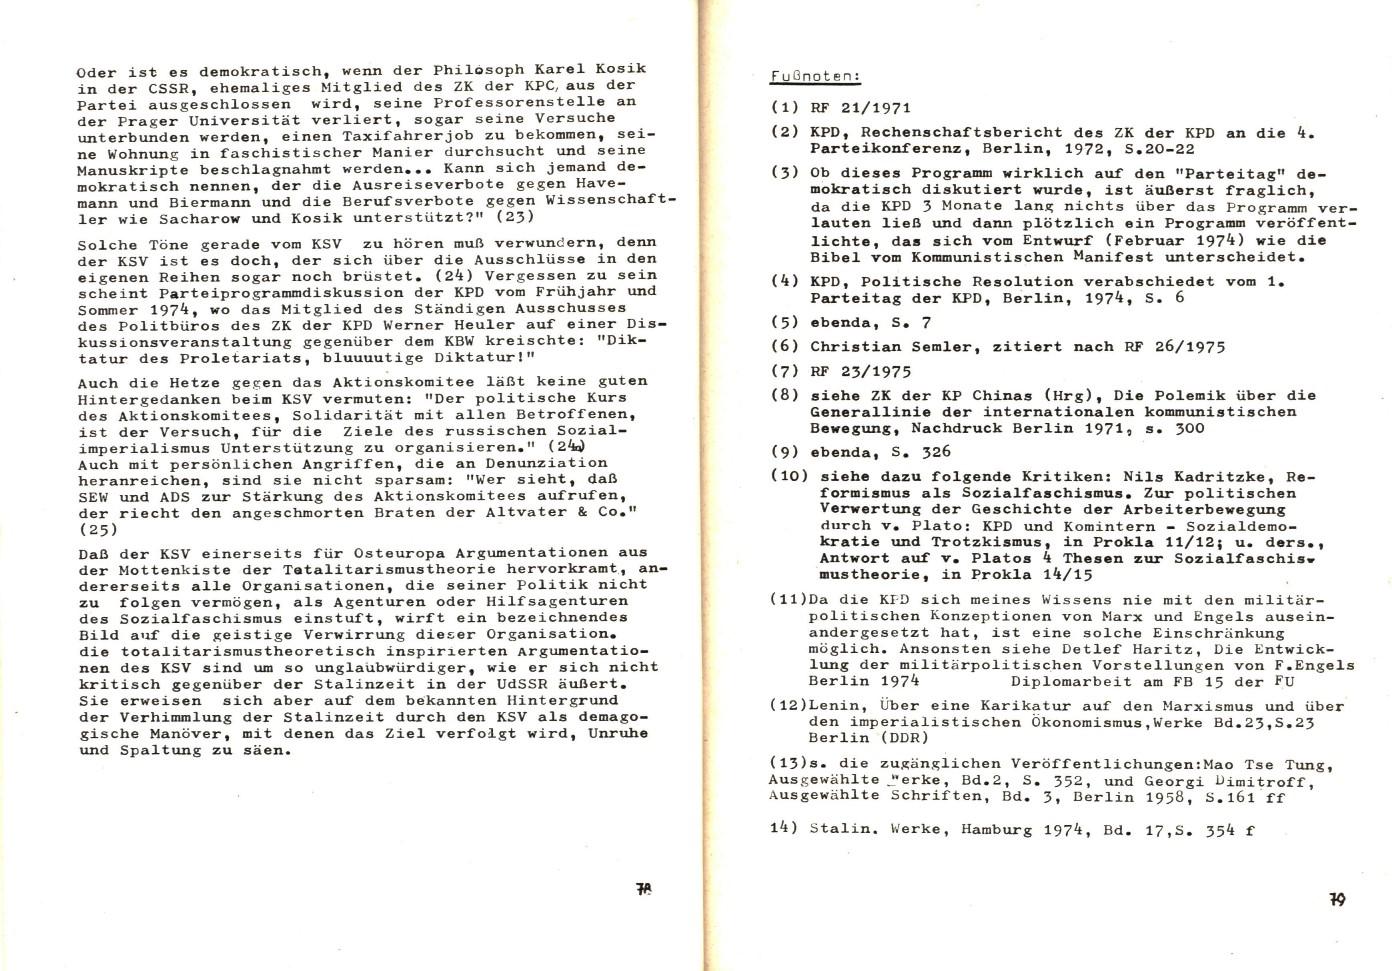 Berlin_KSV_1975_Dokumente_der_SAZ_41